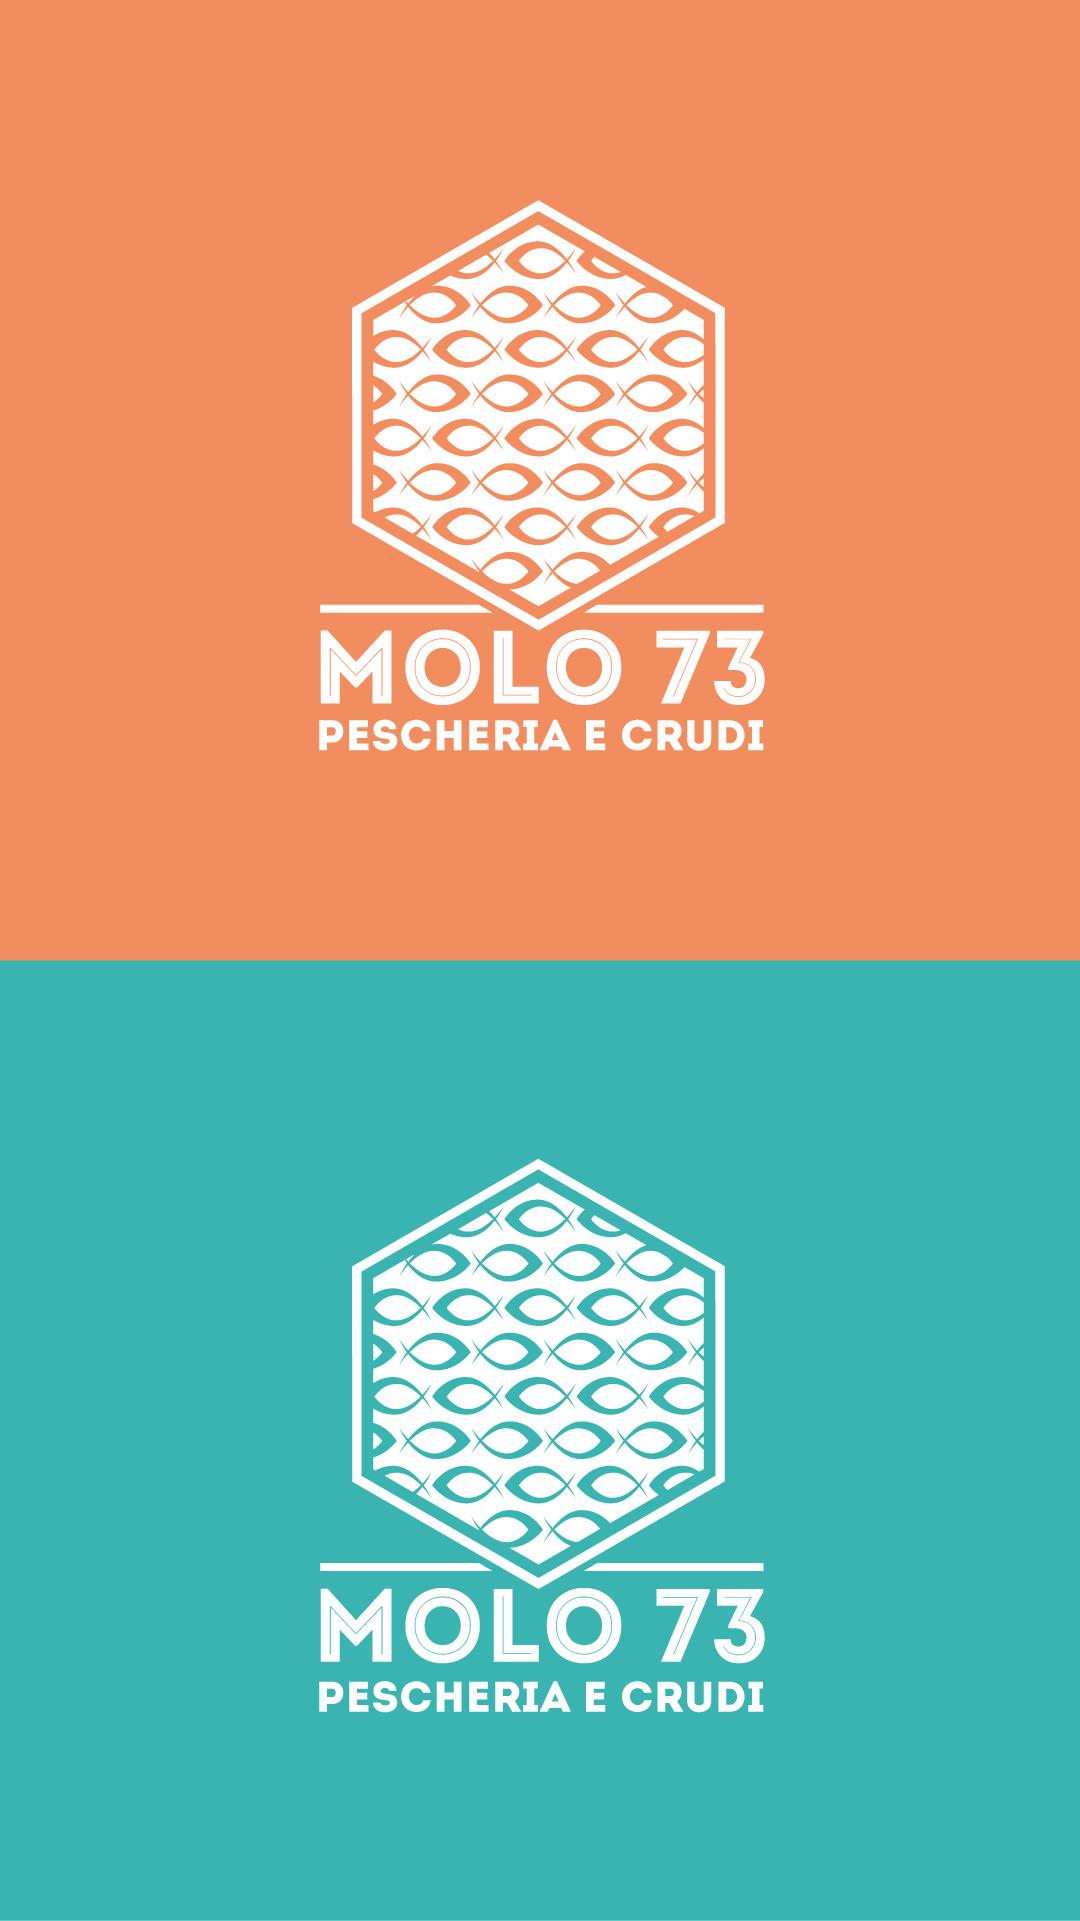 https://www.orlandinifrancesco.com/wp/wp-content/uploads/2019/01/Molo-72-Logo-2.jpg